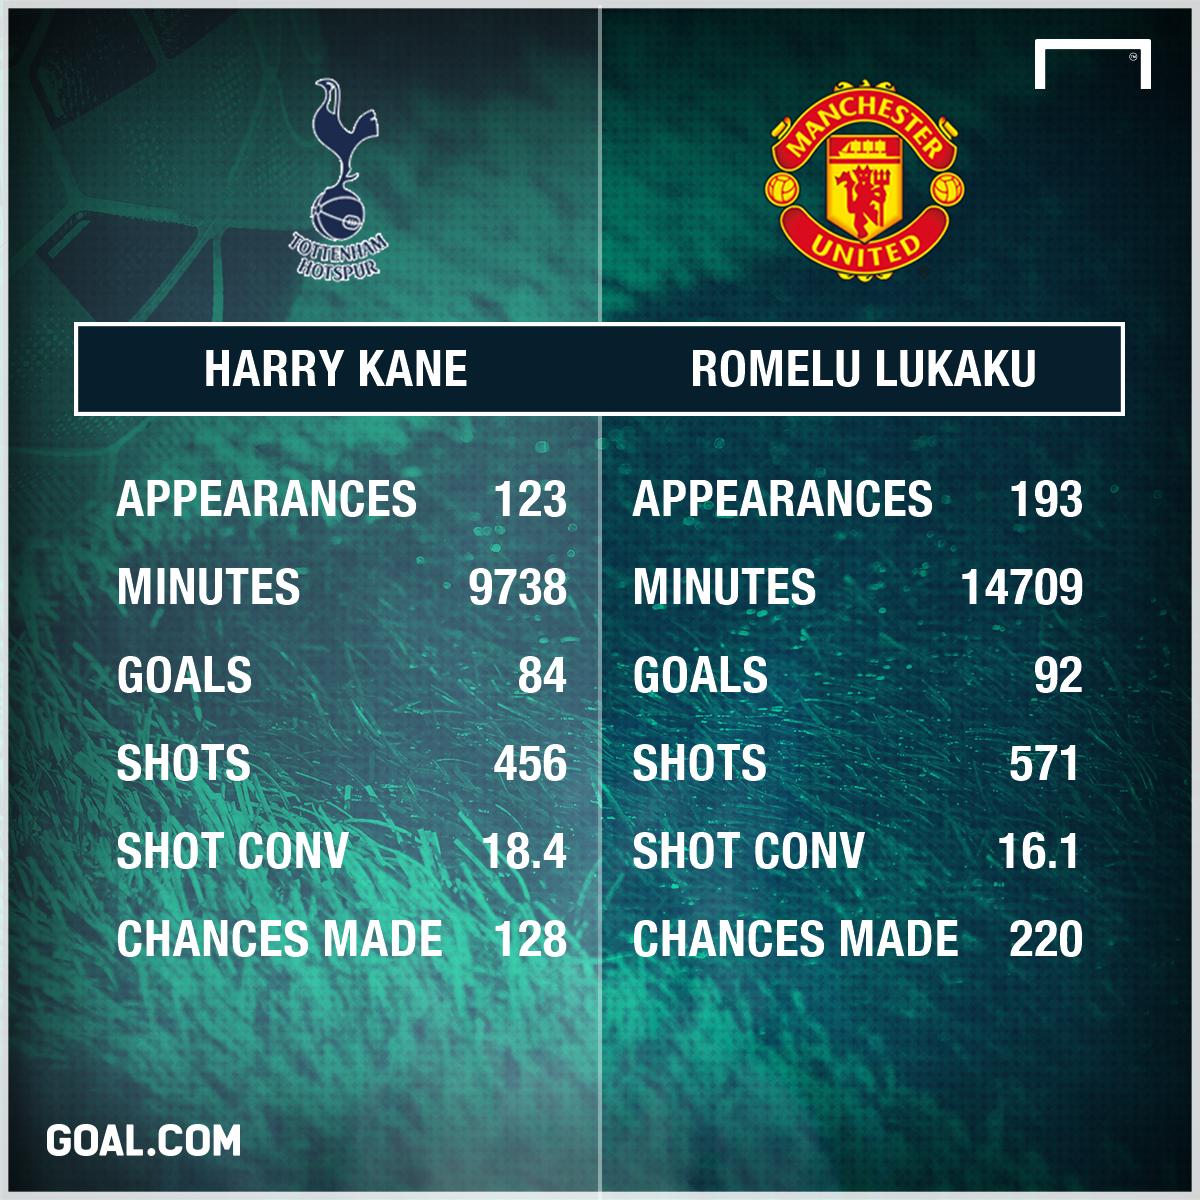 Kane vs Lukaku stats